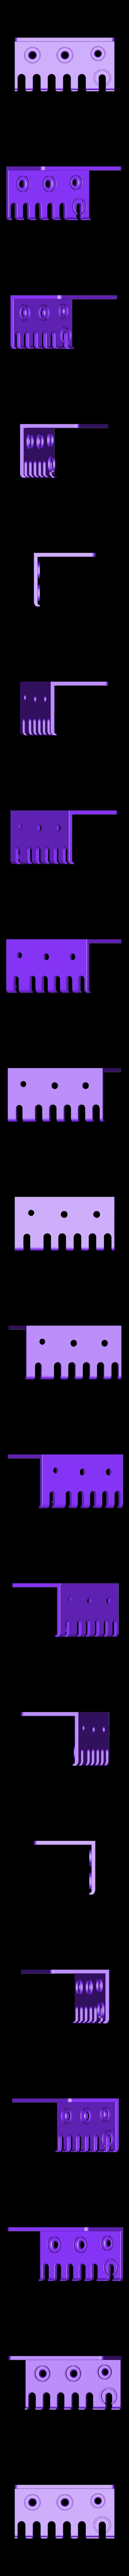 Right_Screws.stl Download free STL file Tool Holder for 18pcs Screwdriver Set 059 I for screws or peg board • 3D printing template, Wiesemann1893